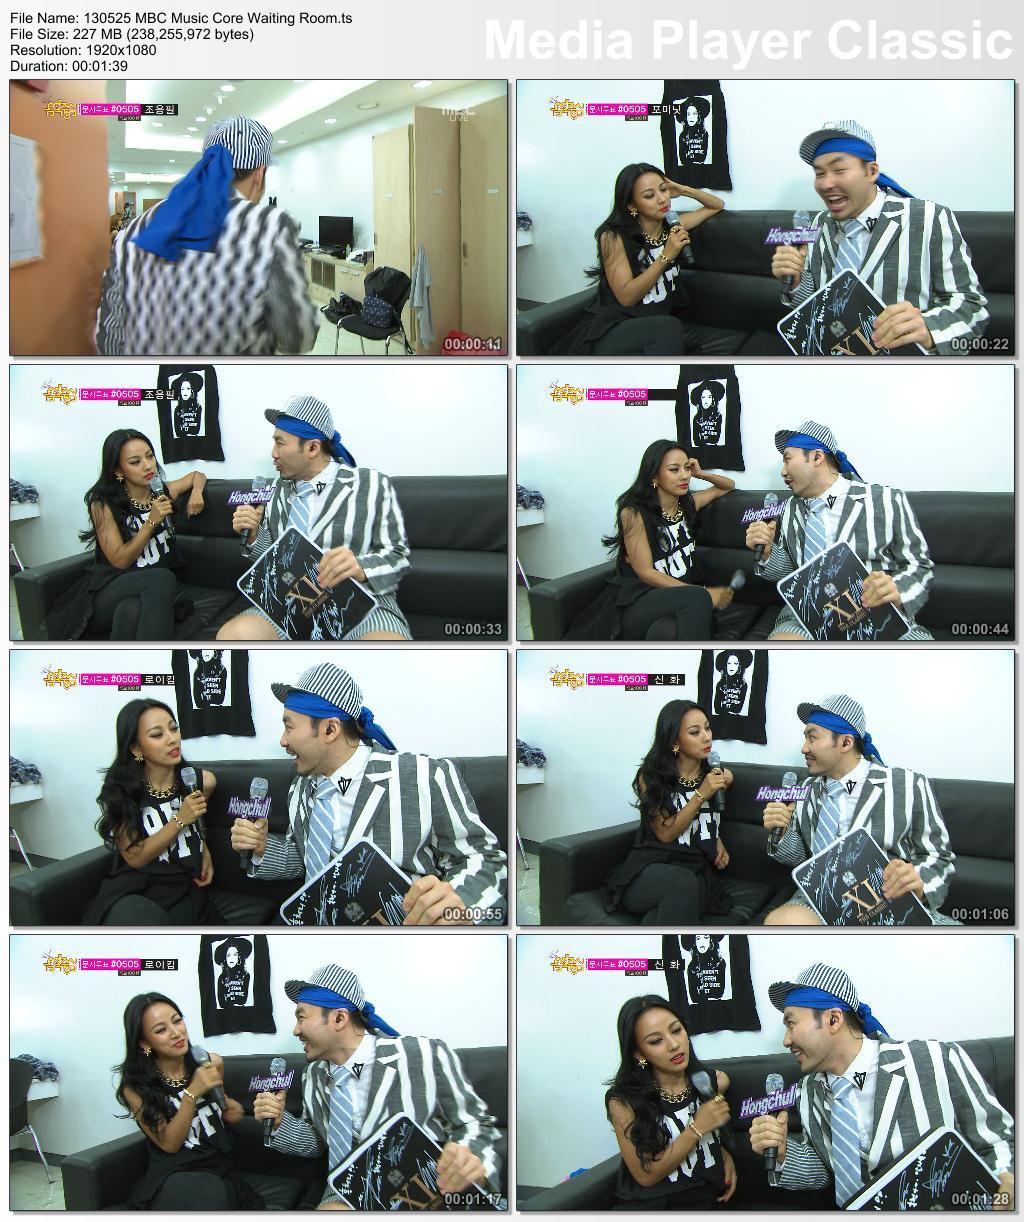 [130525] Hyori - Waiting Room, Holly Jolly Bus & Bad Girls @ MBC Music Core 13052510